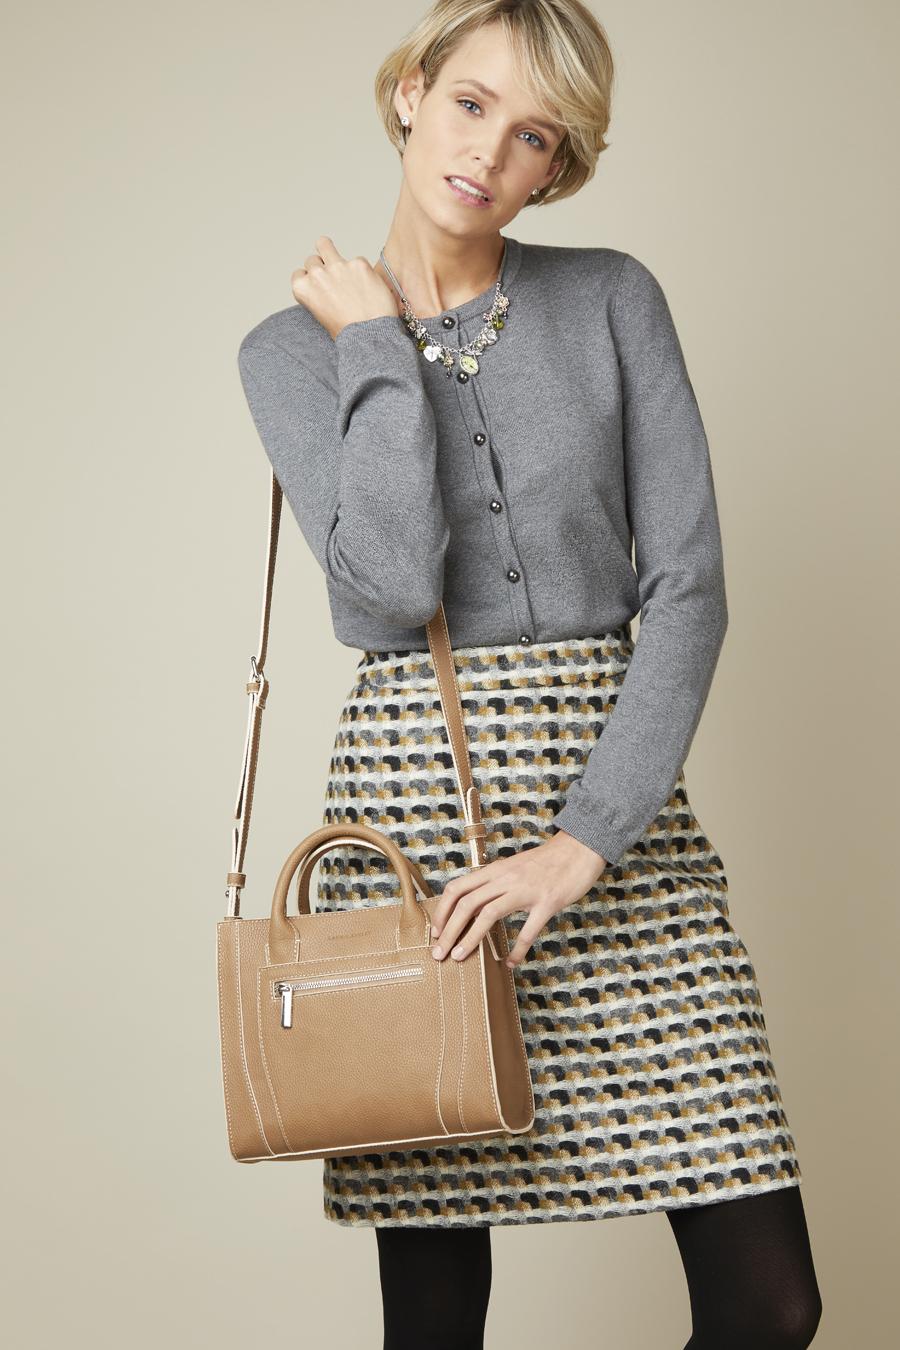 Back To Work Wardrobe Fashion Accessories